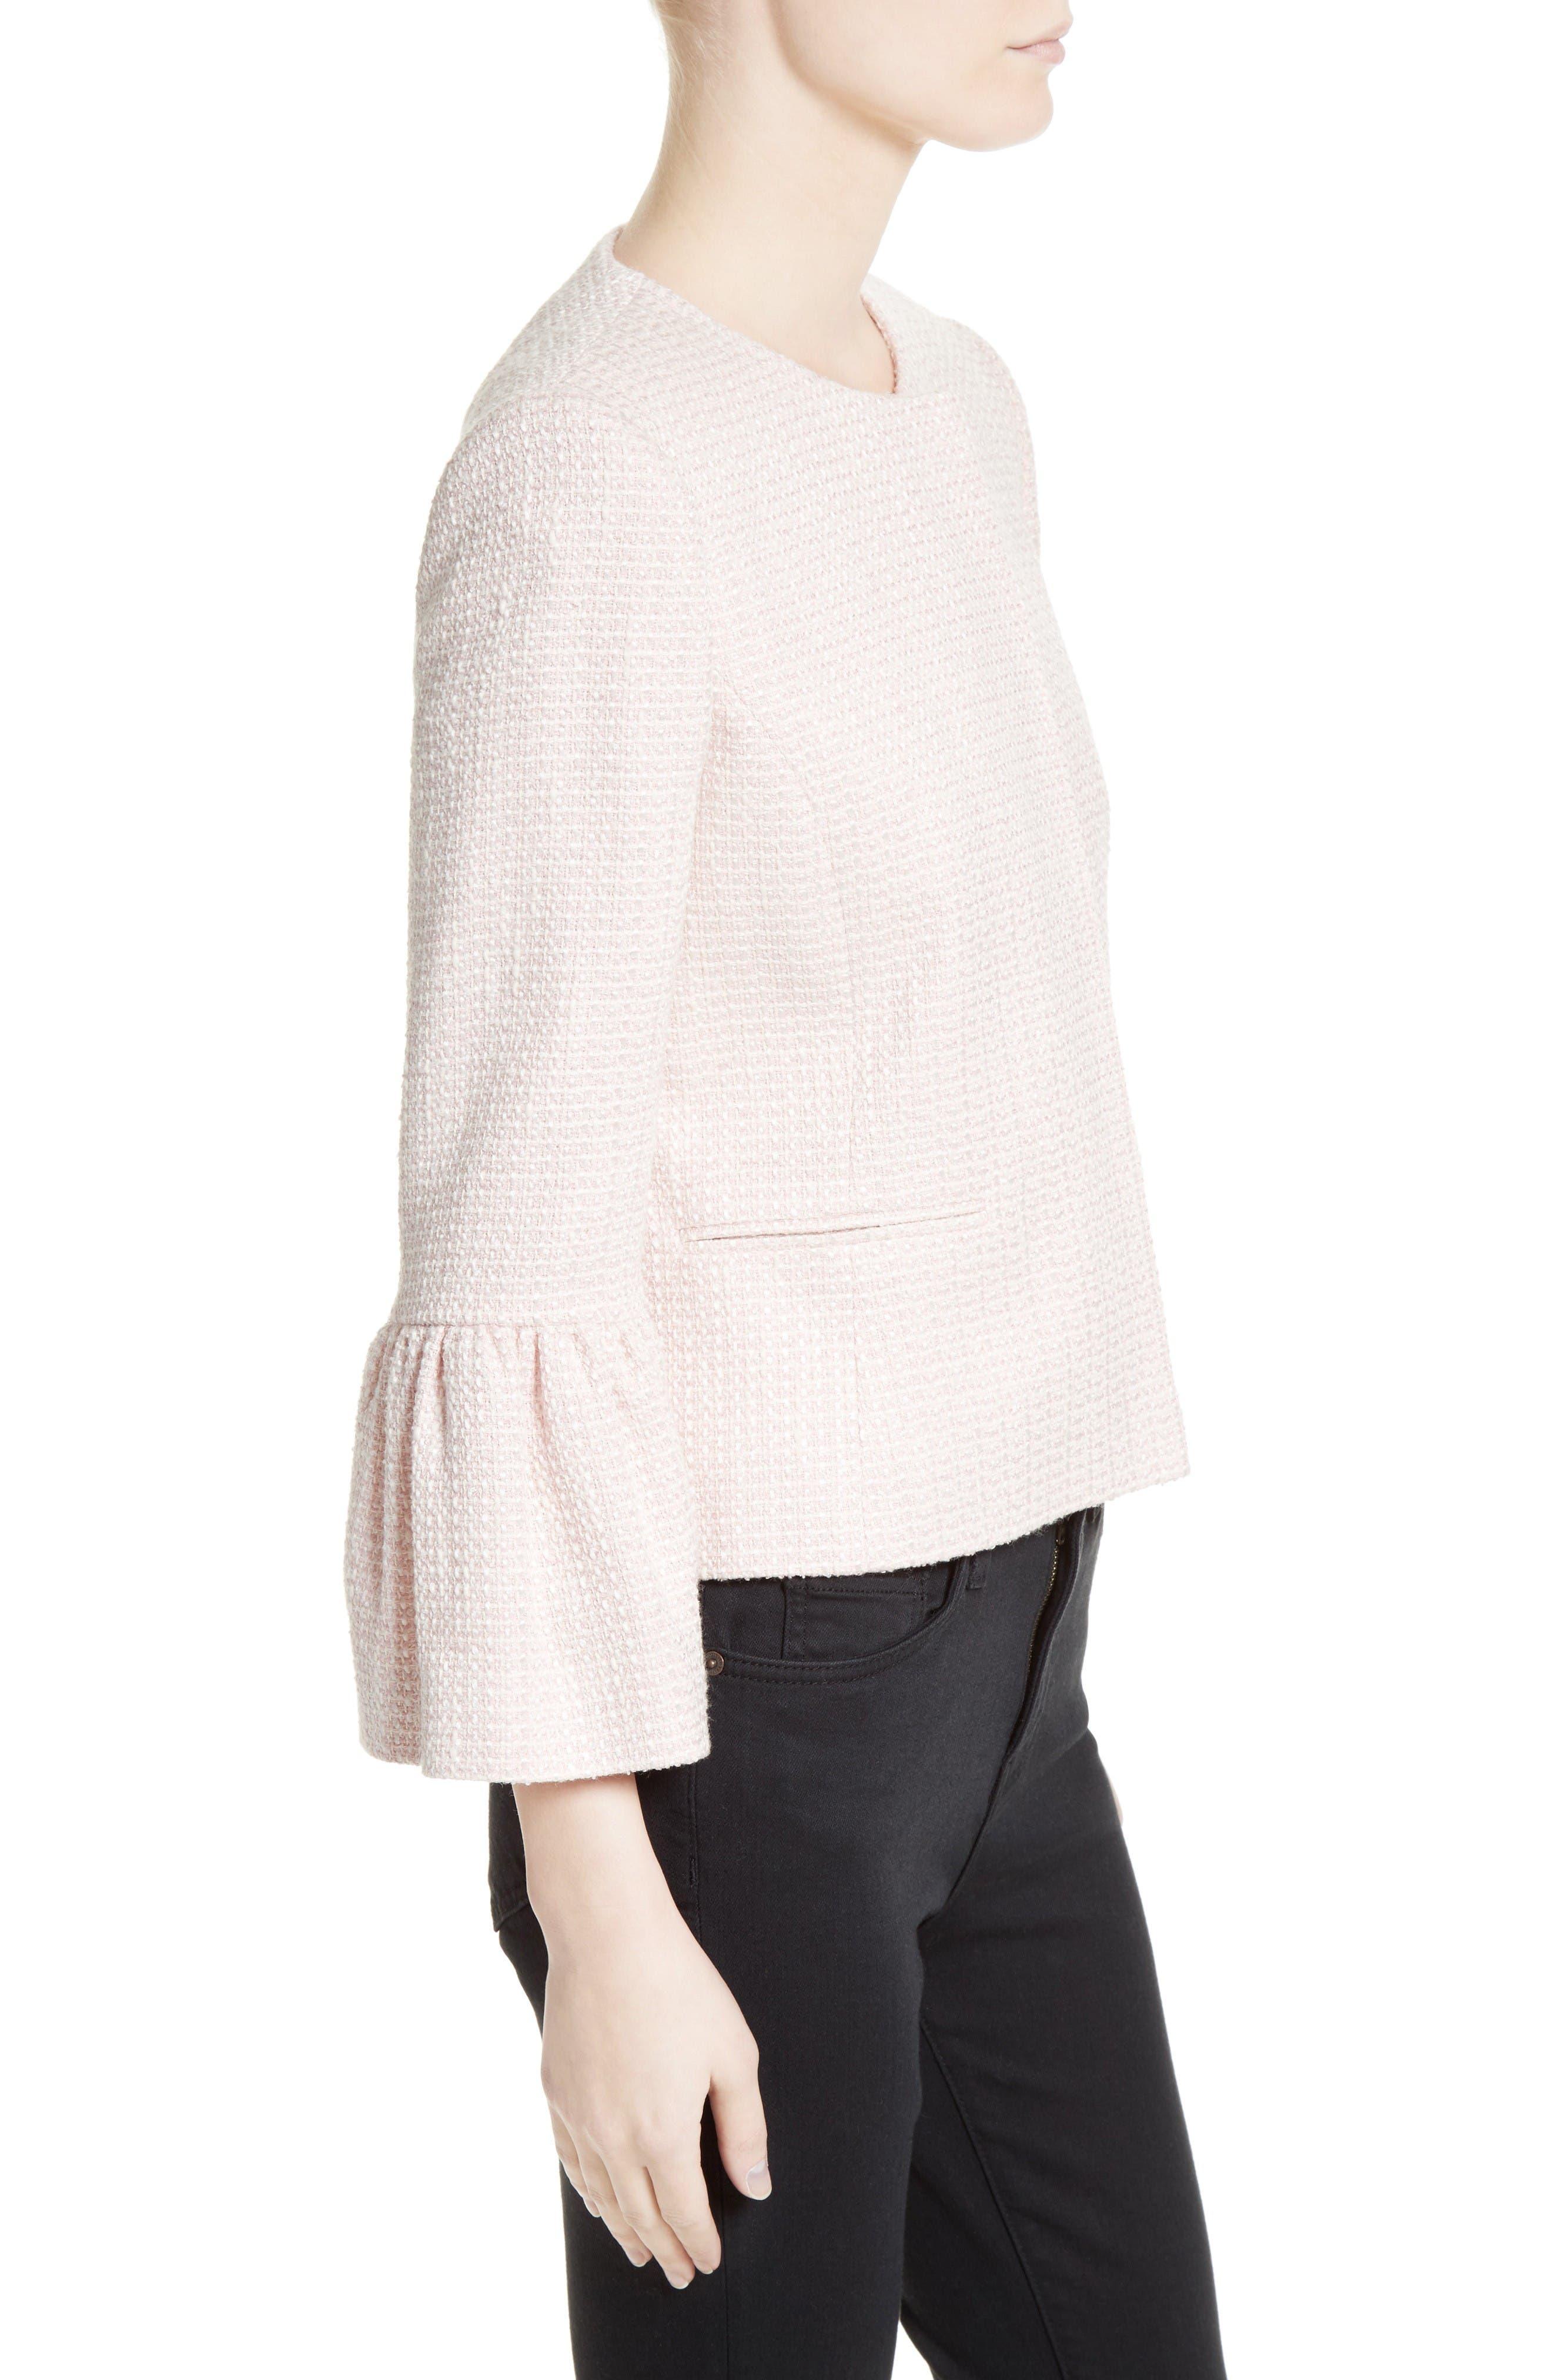 Tweed Jacket,                             Alternate thumbnail 4, color,                             Pale Pink/ Ivory